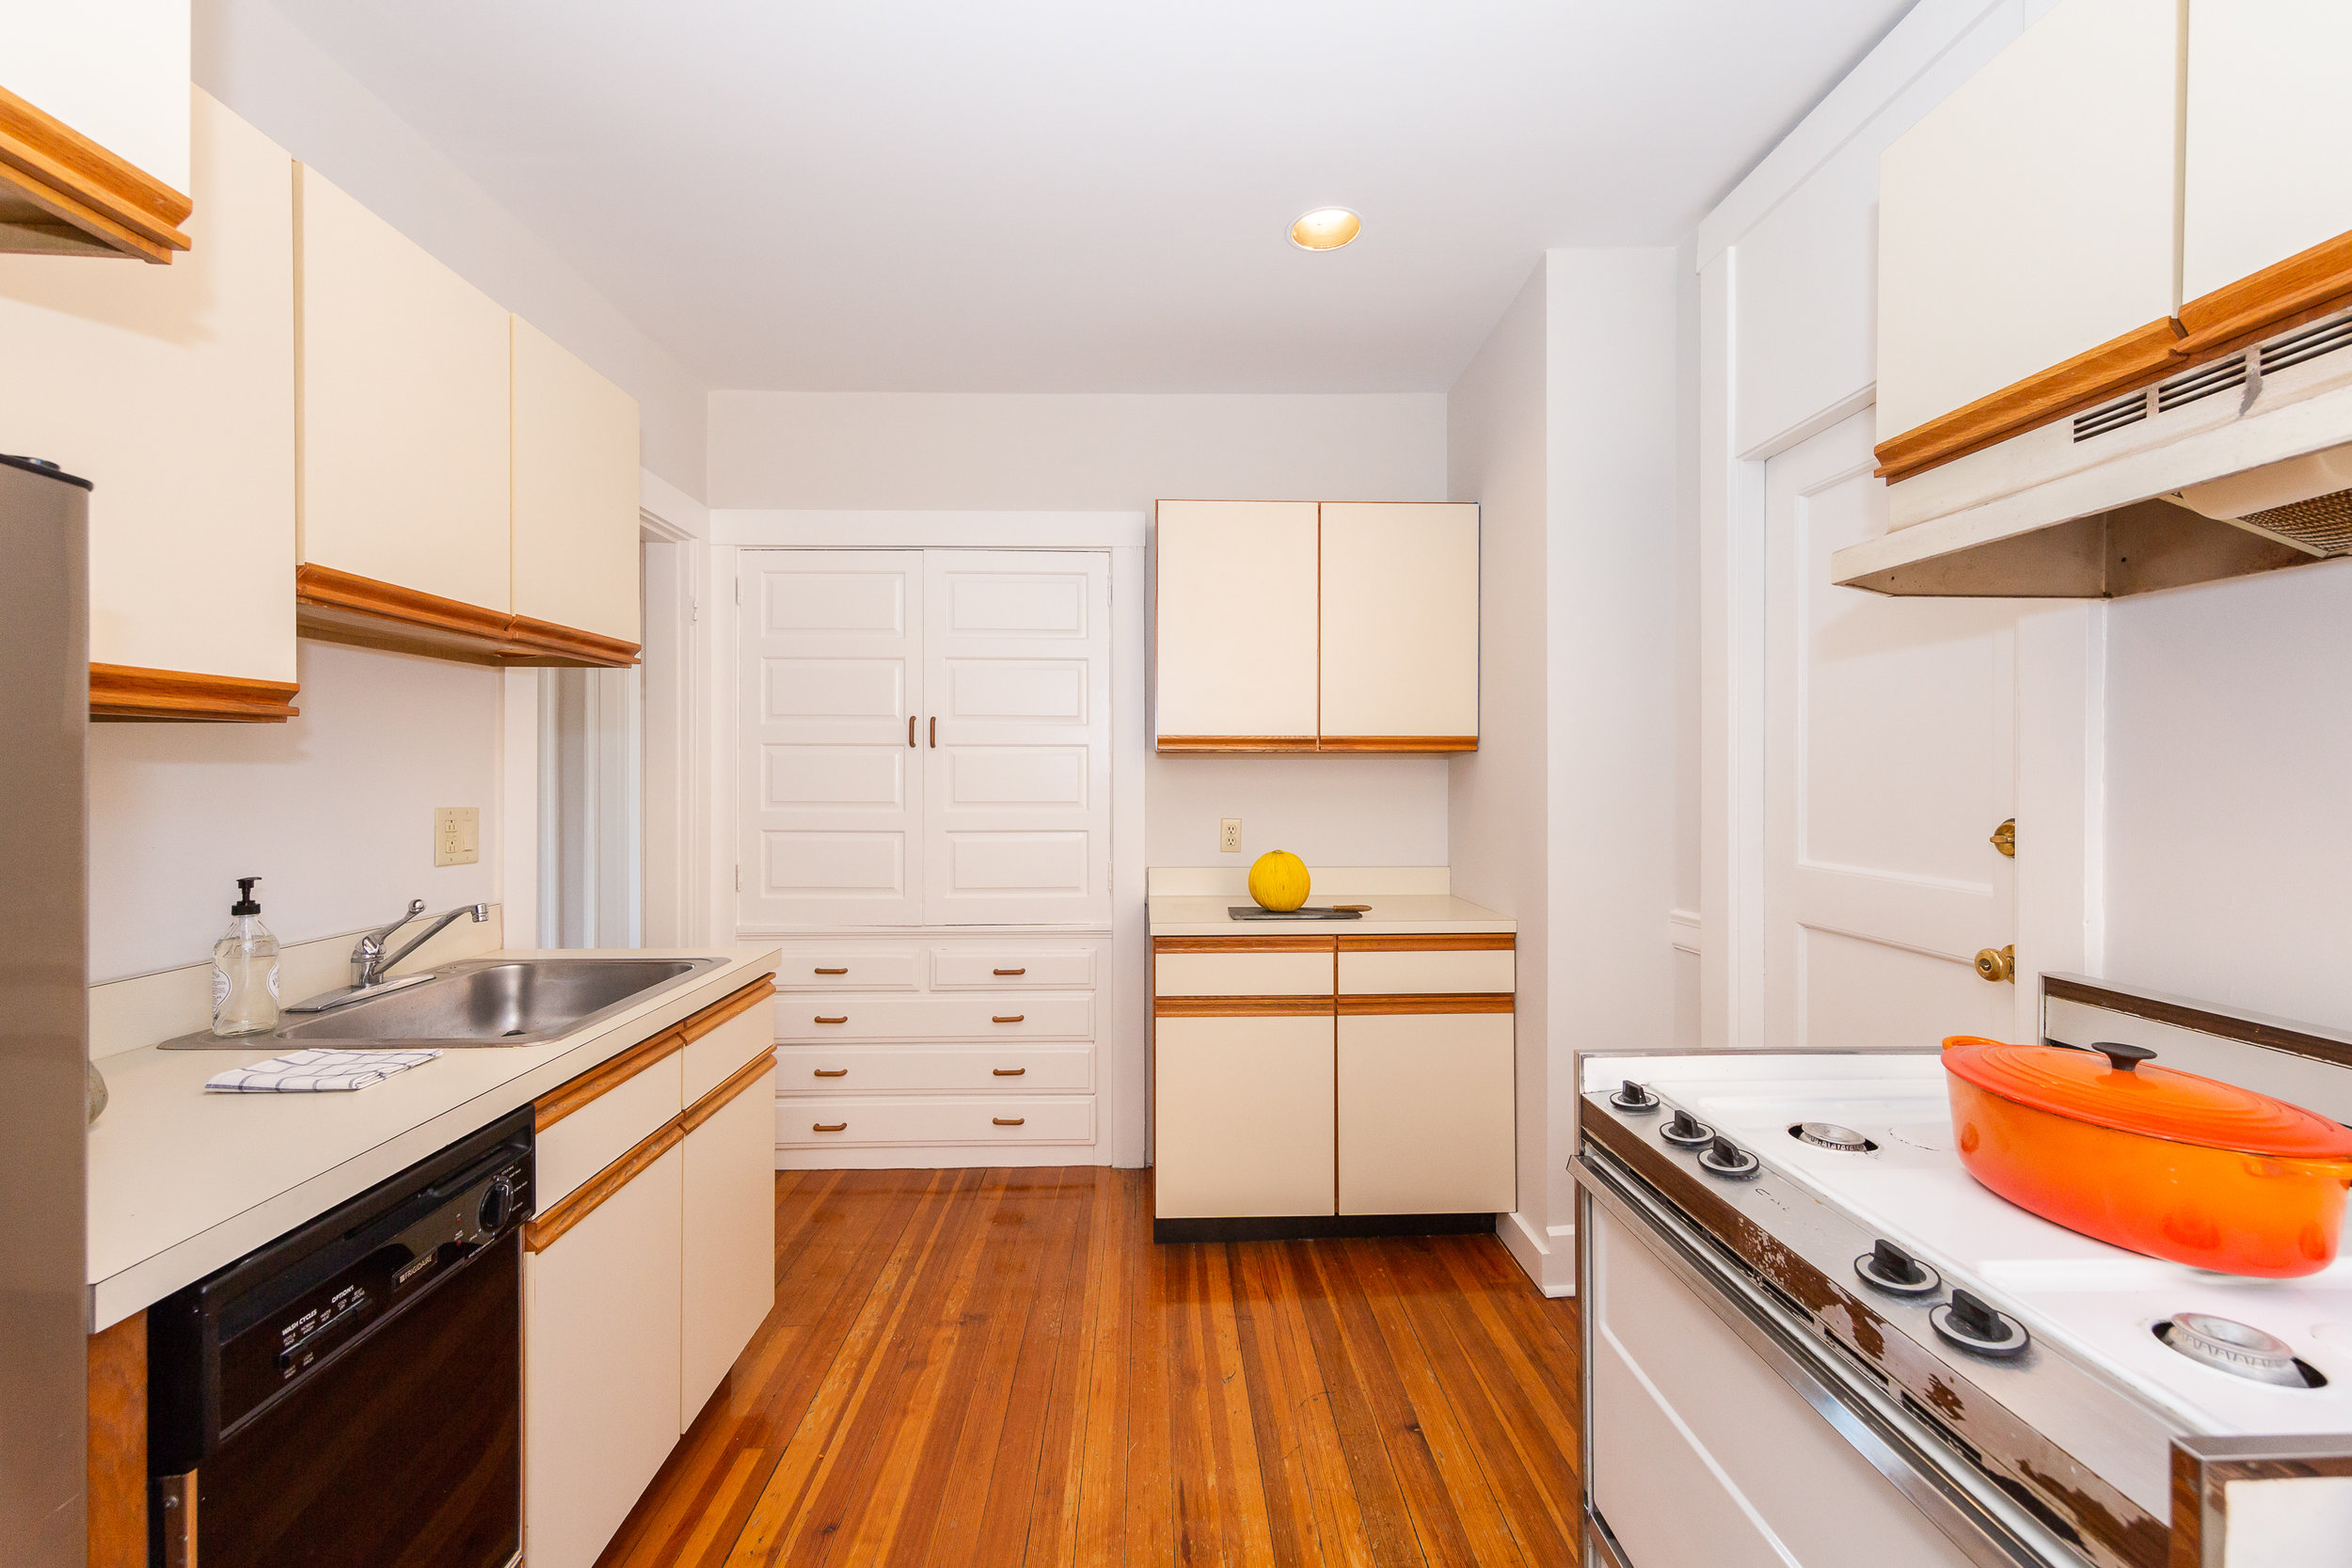 1783 Massachusetts Ave, Cambridge, MA_Property-Precision-8.jpg